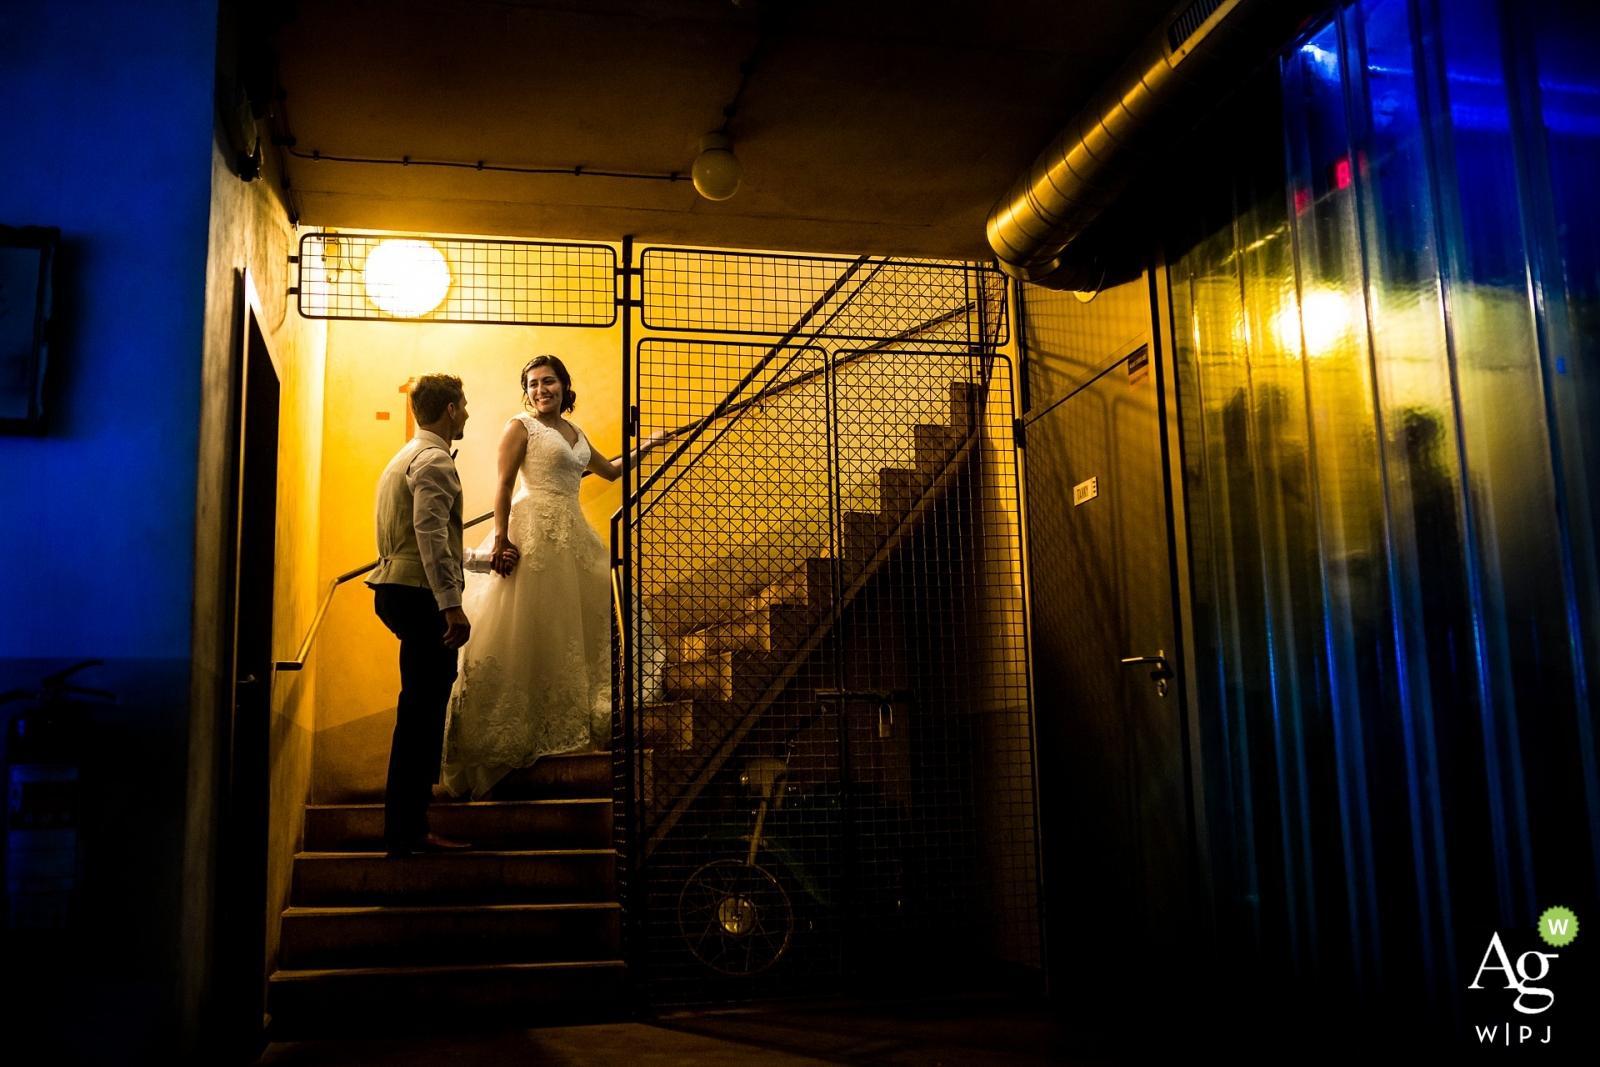 Prague Wedding Photographers   Image contains: bride, groom, portrait, dress, suit, stairwell